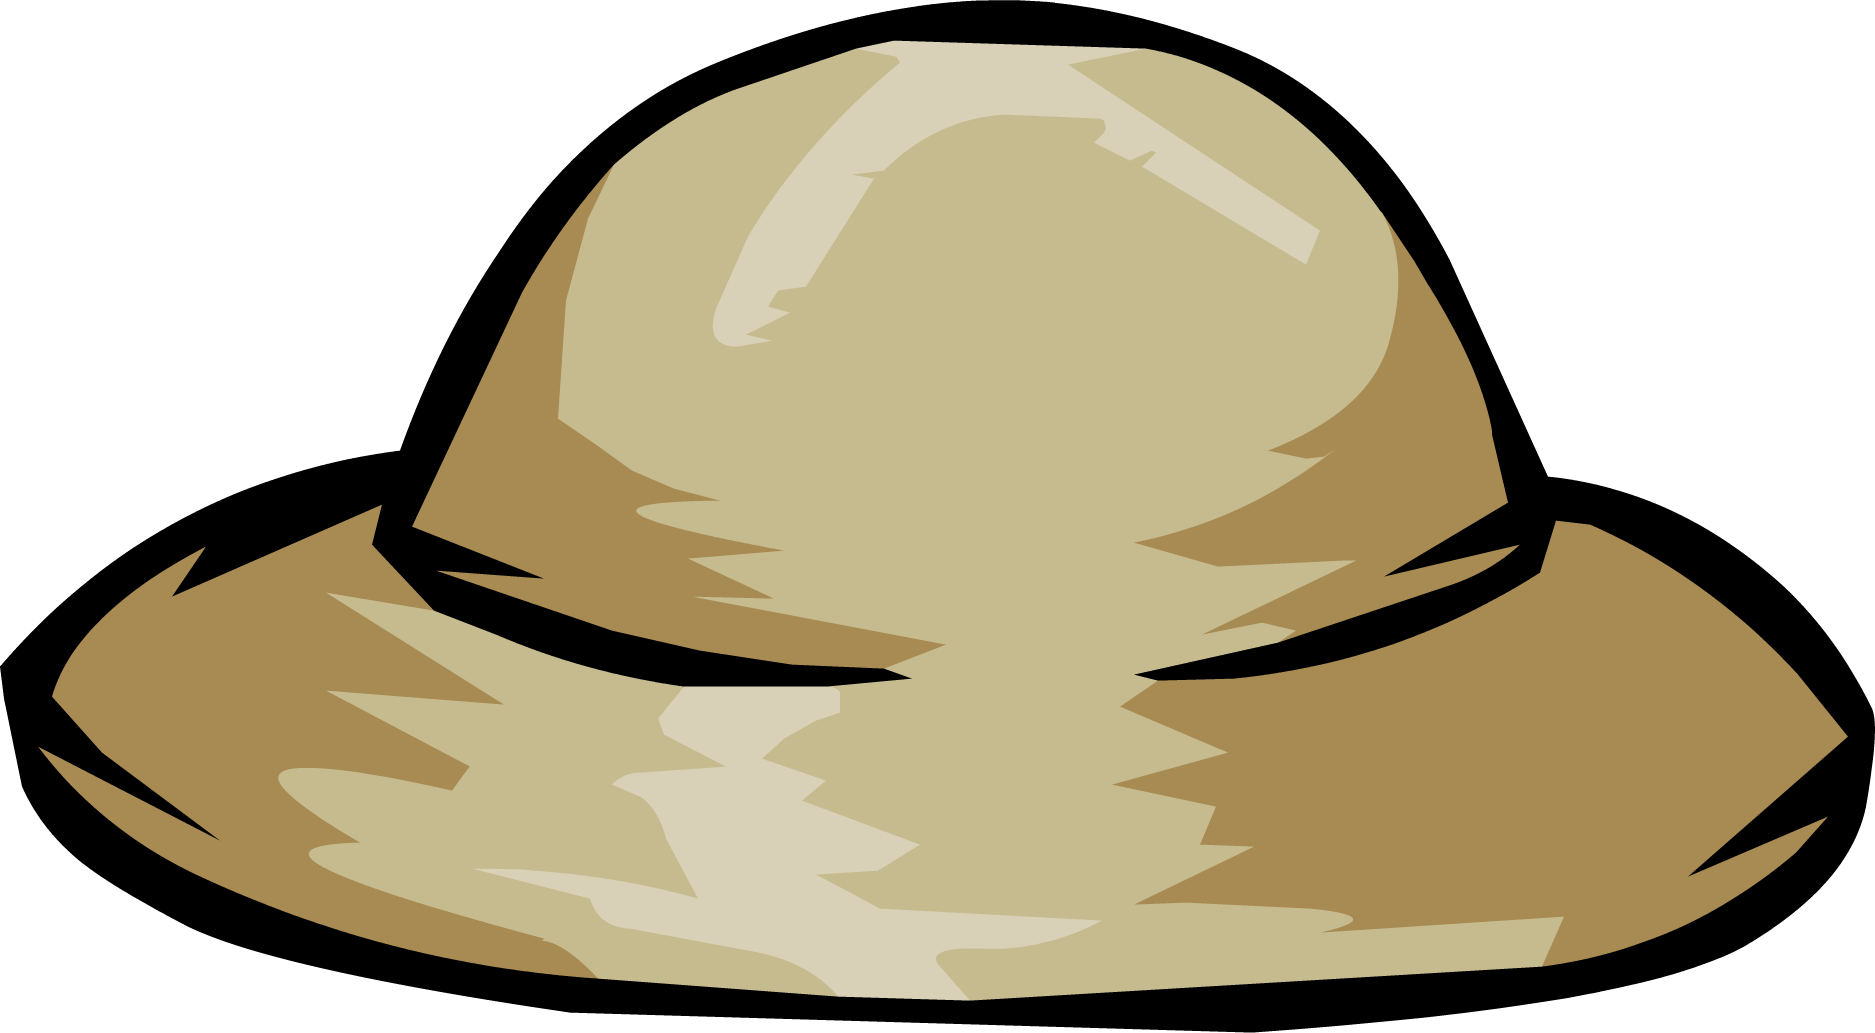 Safari clipart hat clip art By Club Hat FANDOM Hat